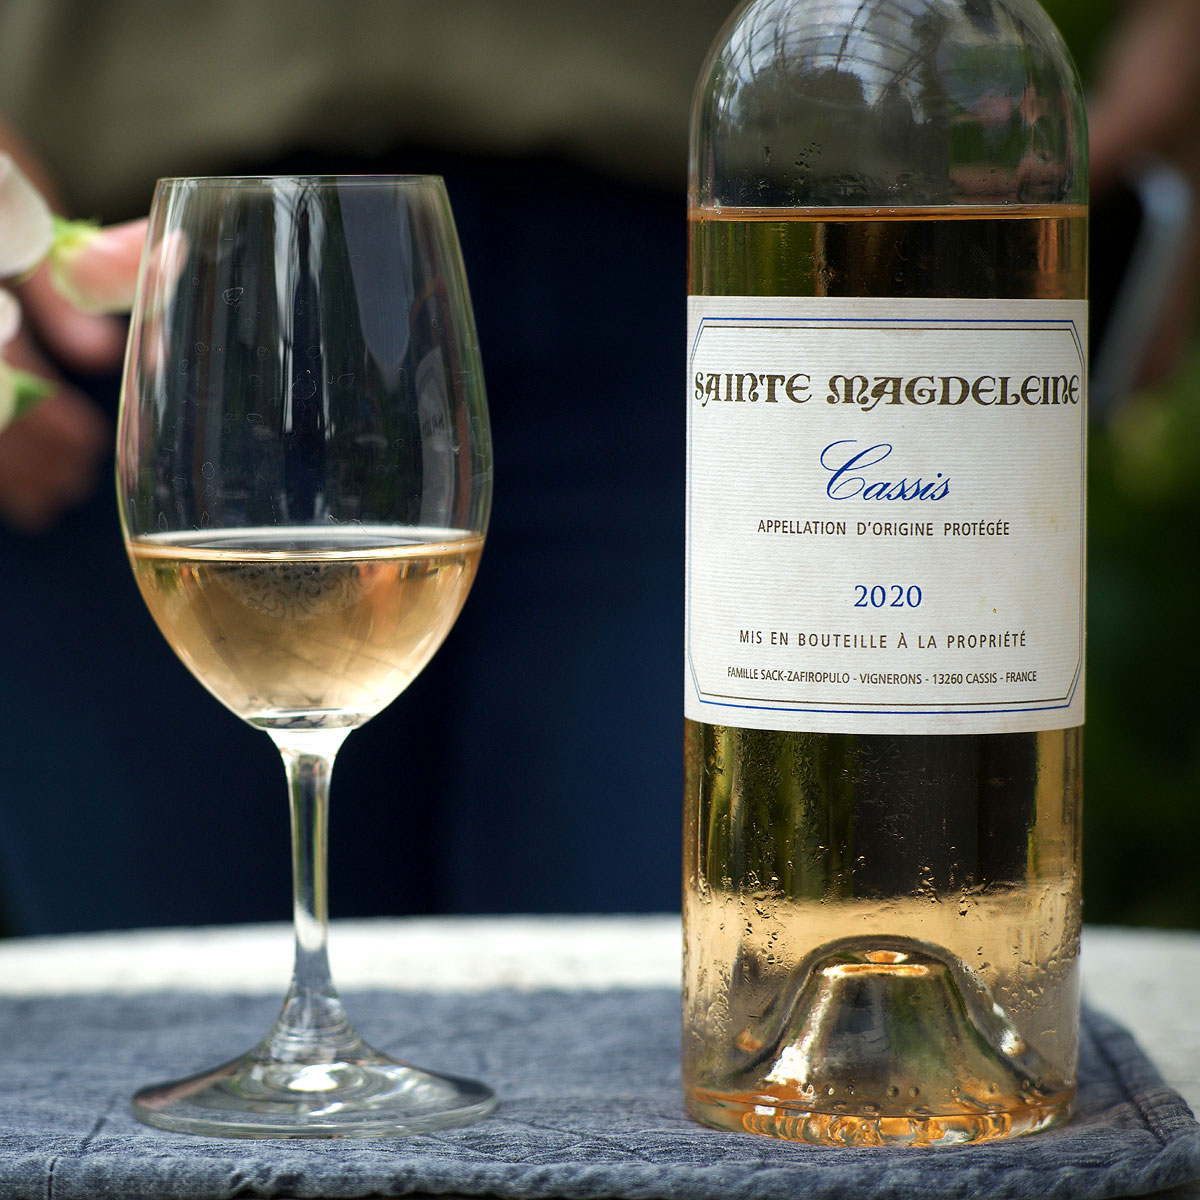 Cassis: Clos Sainte Magdeleine Rosé 2020  - Lifestyle